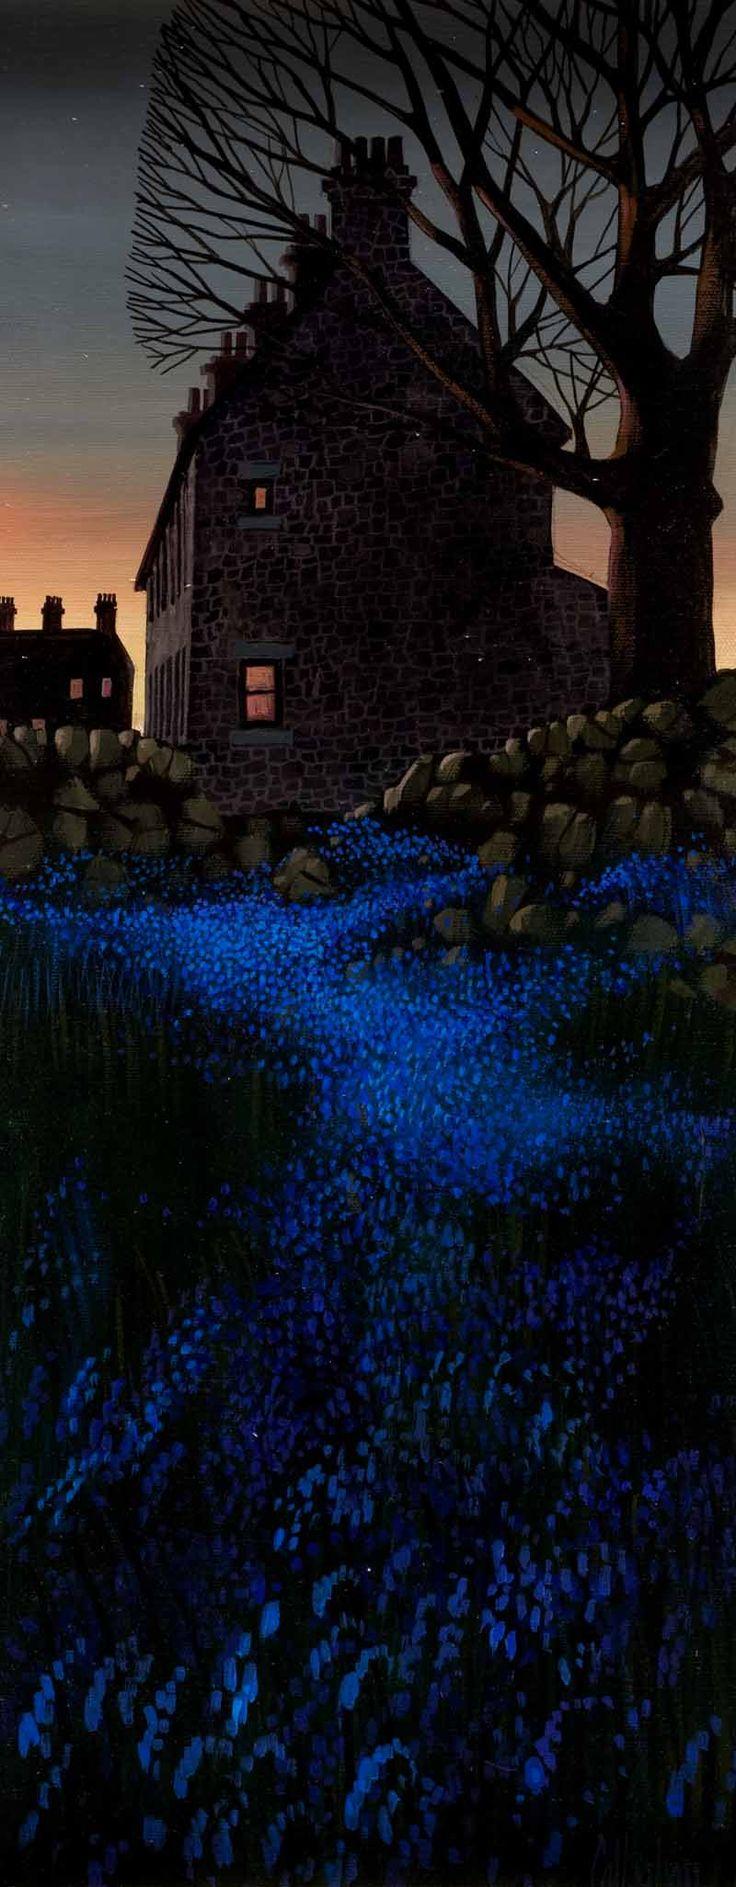 George Callaghan - Bluebells